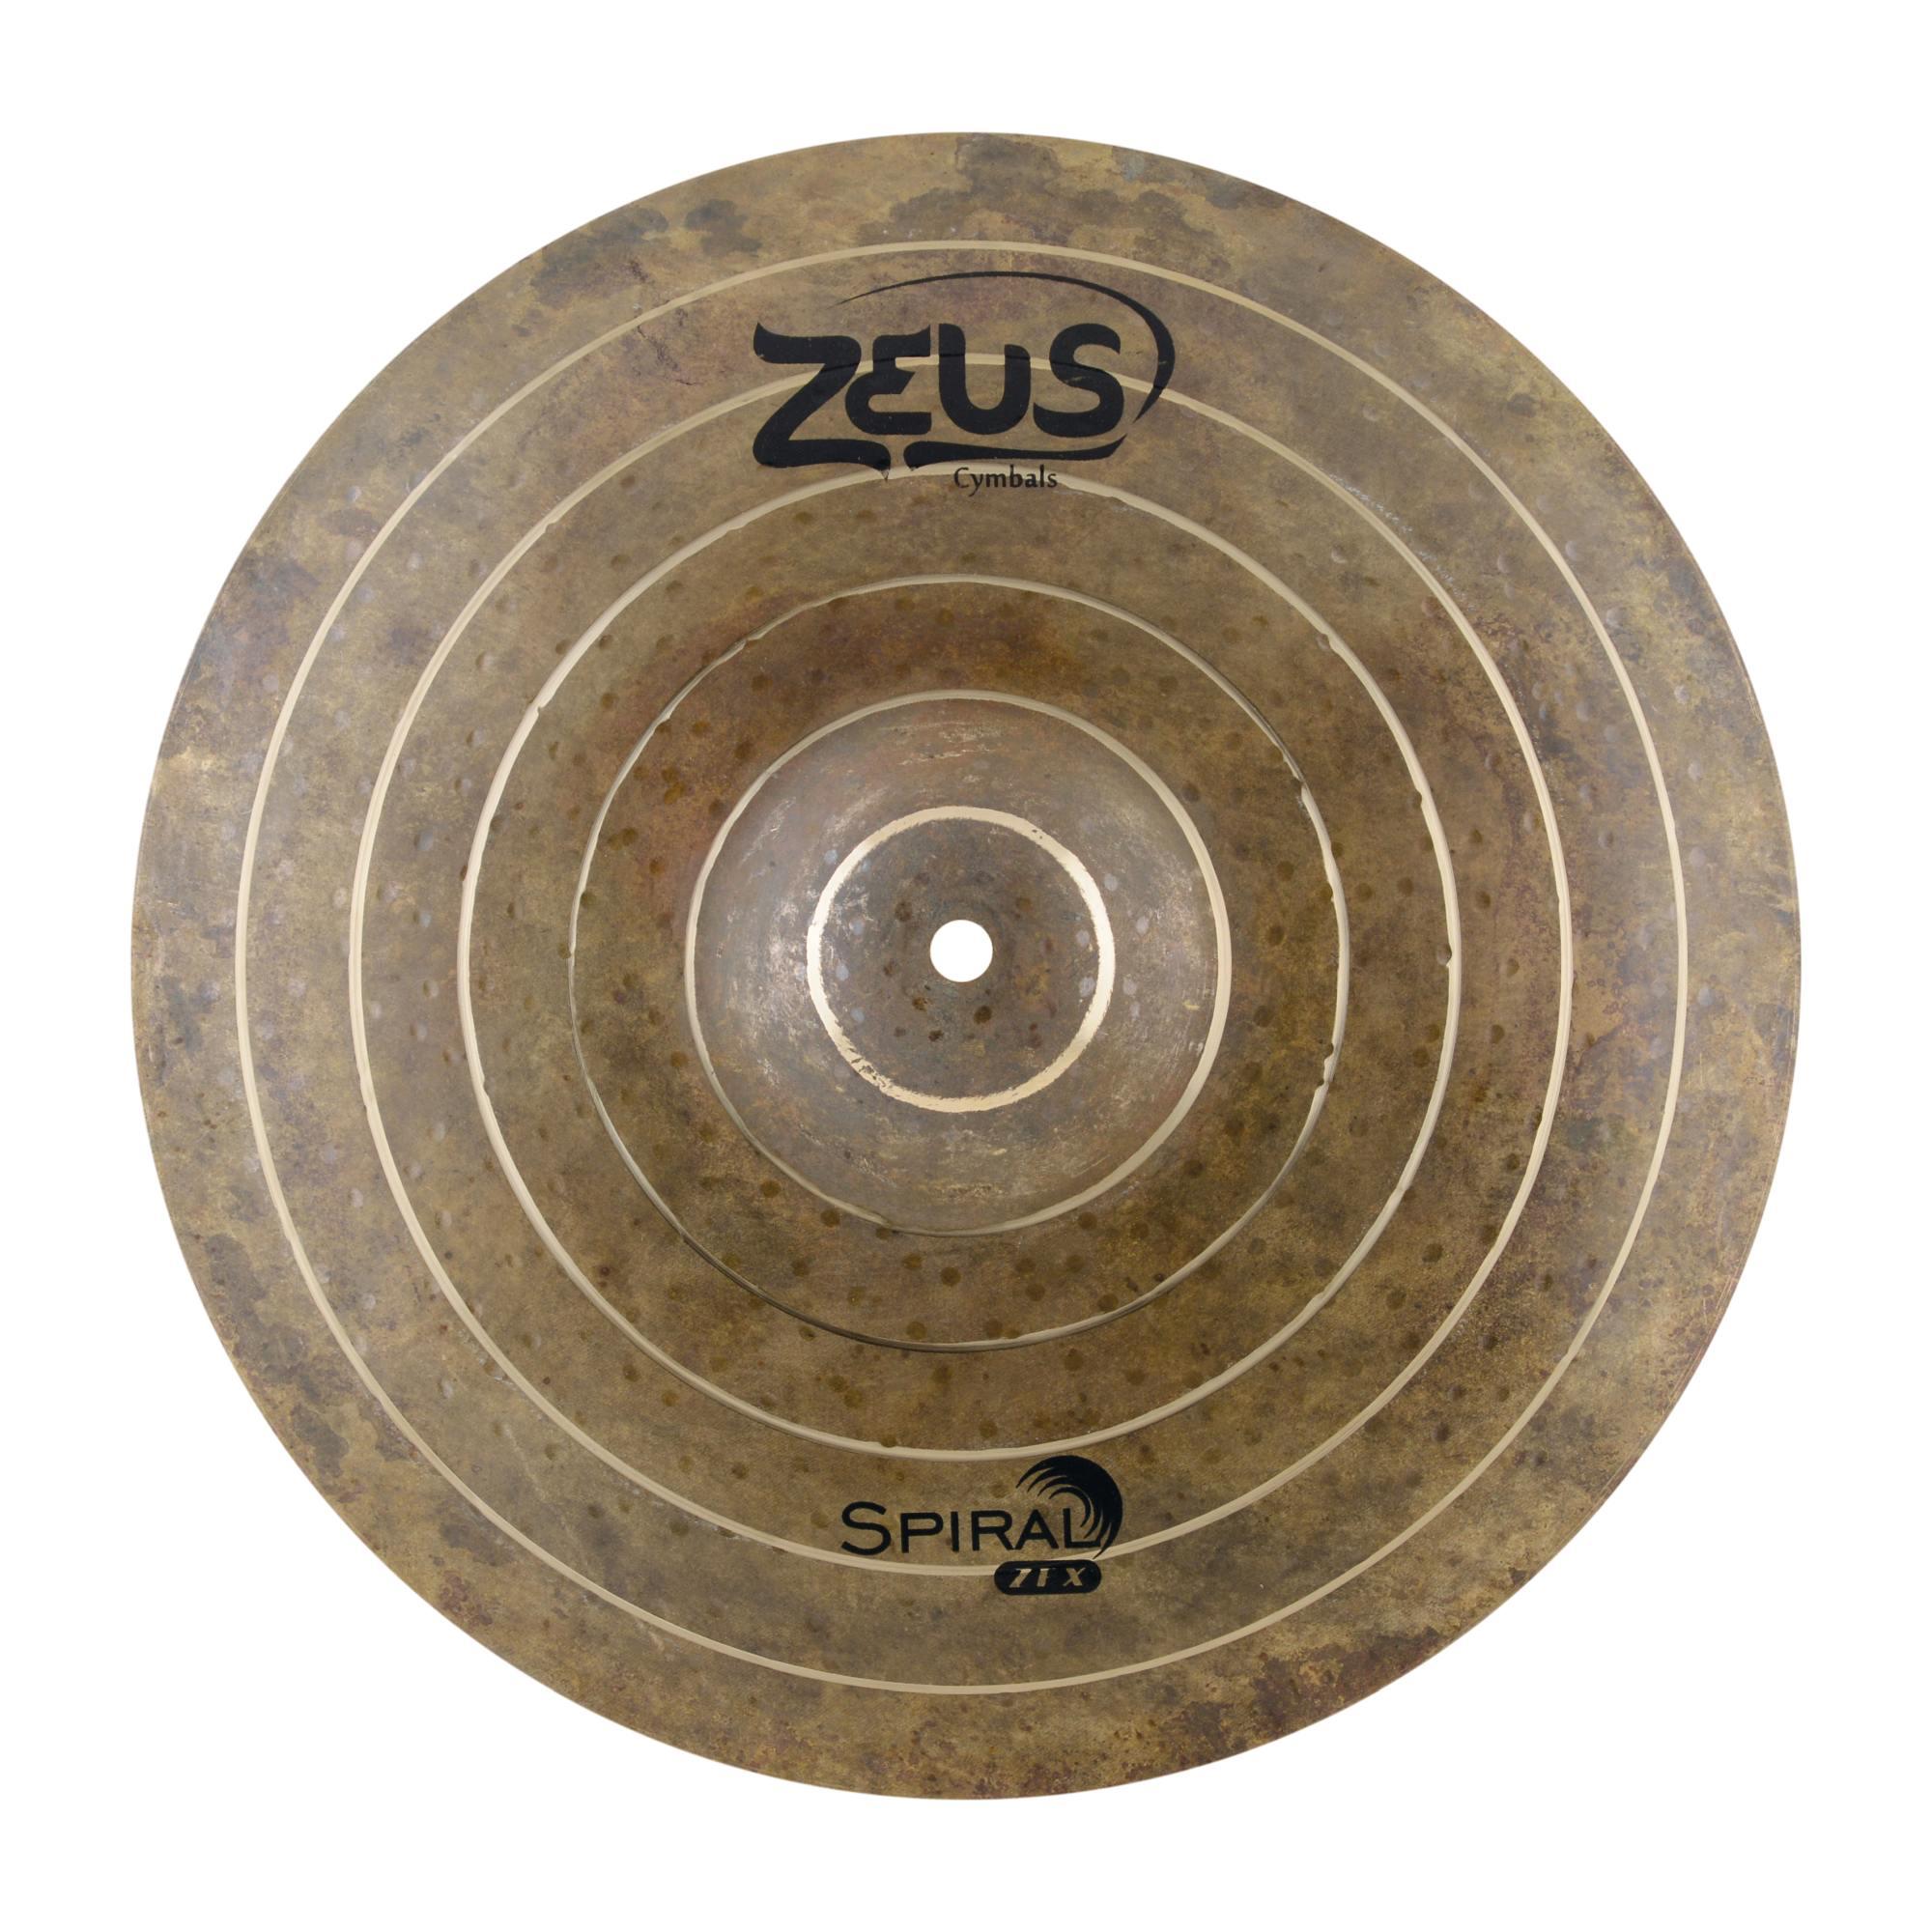 Prato Zeus Spiral Hihat 14 Zsphh14